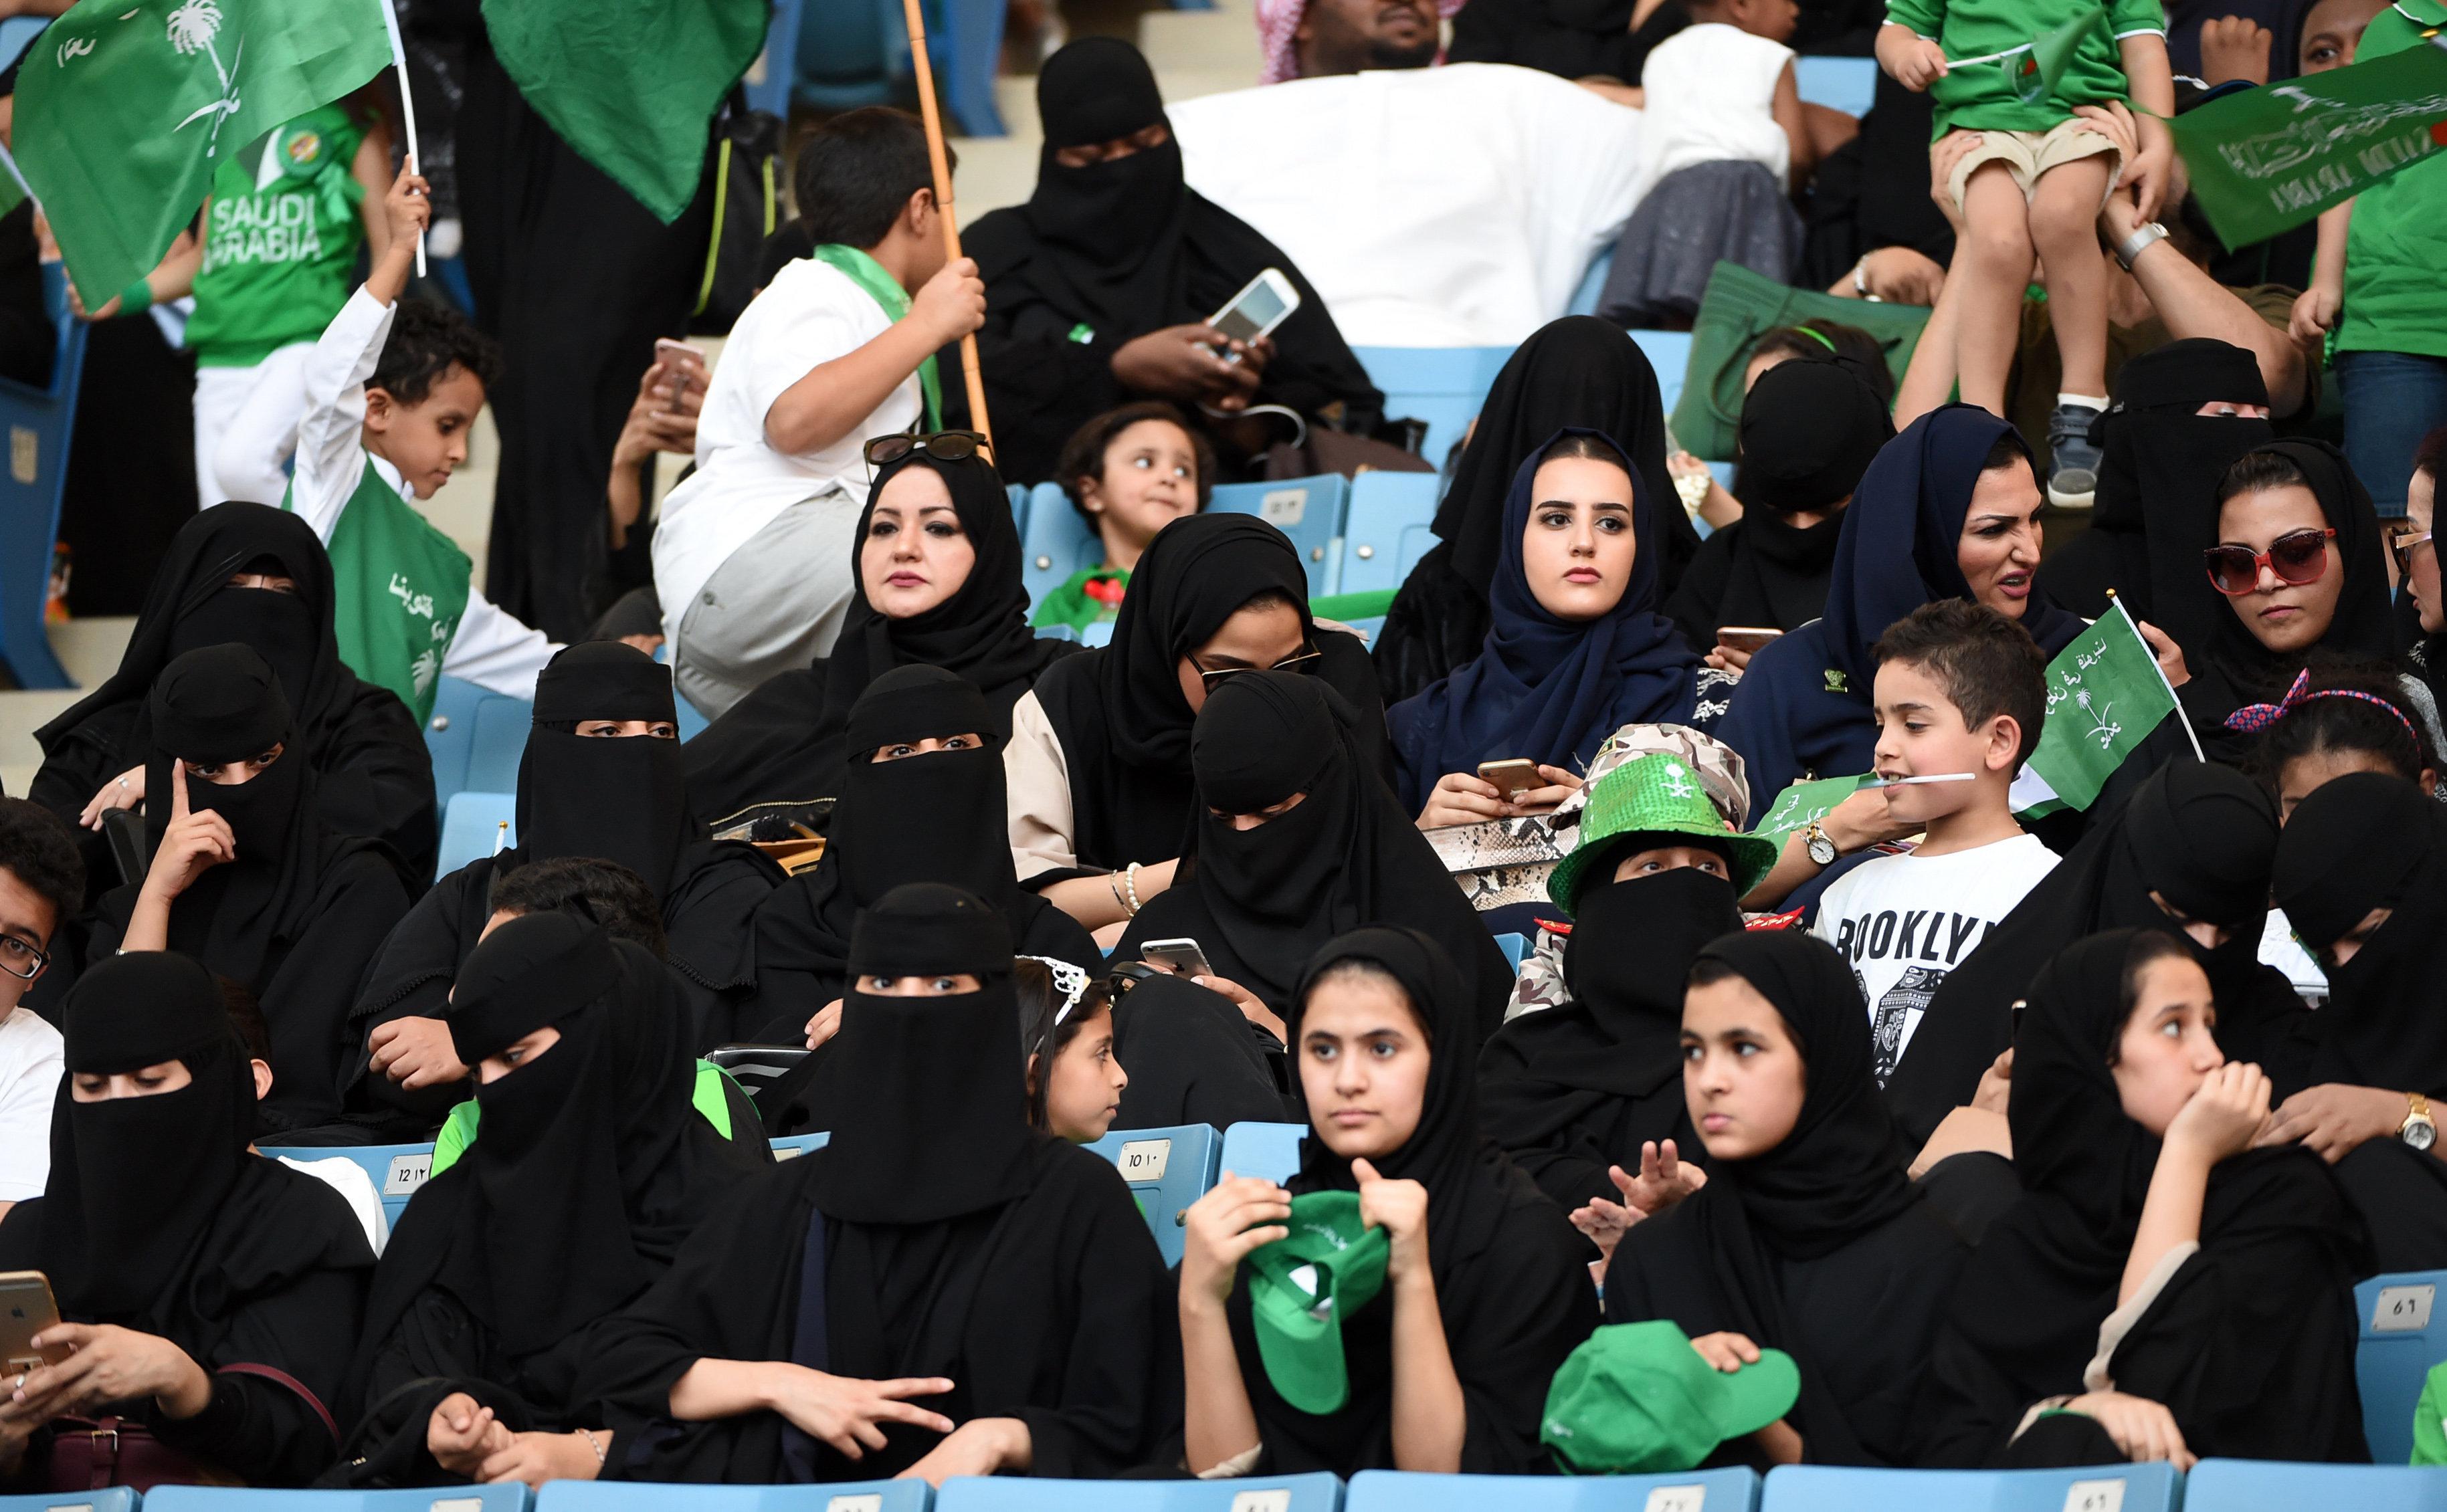 Womencommemorate the anniversary of Saudi Arabia's founding atKing Fahd International Stadium in Riyadh on Sept.